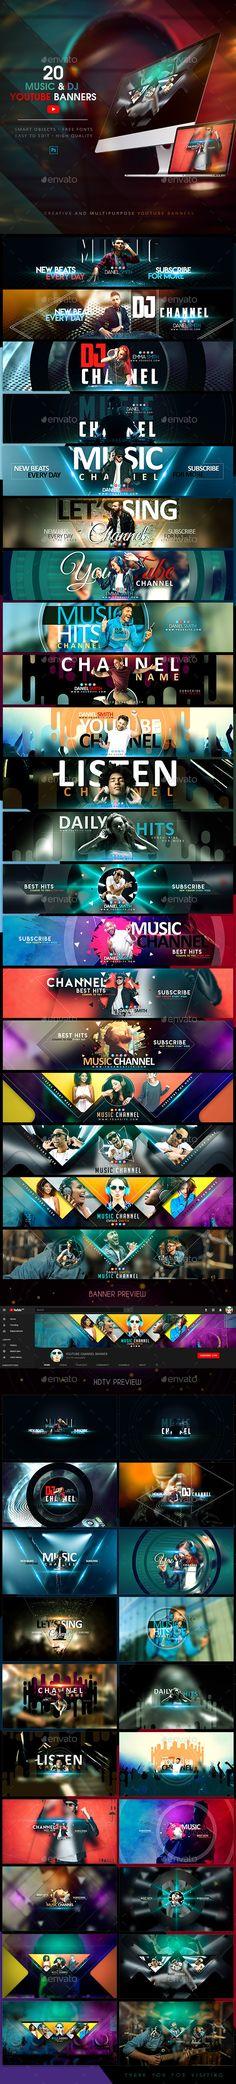 YouTube Bundle - 20 Music & DJ Banners - YouTube Social Media Social Media Detox, Social Media Content, Social Media Graphics, Youtube Banner Template, Youtube Banners, Social Media Branding, Social Media Design, Banners Music, Web Banners